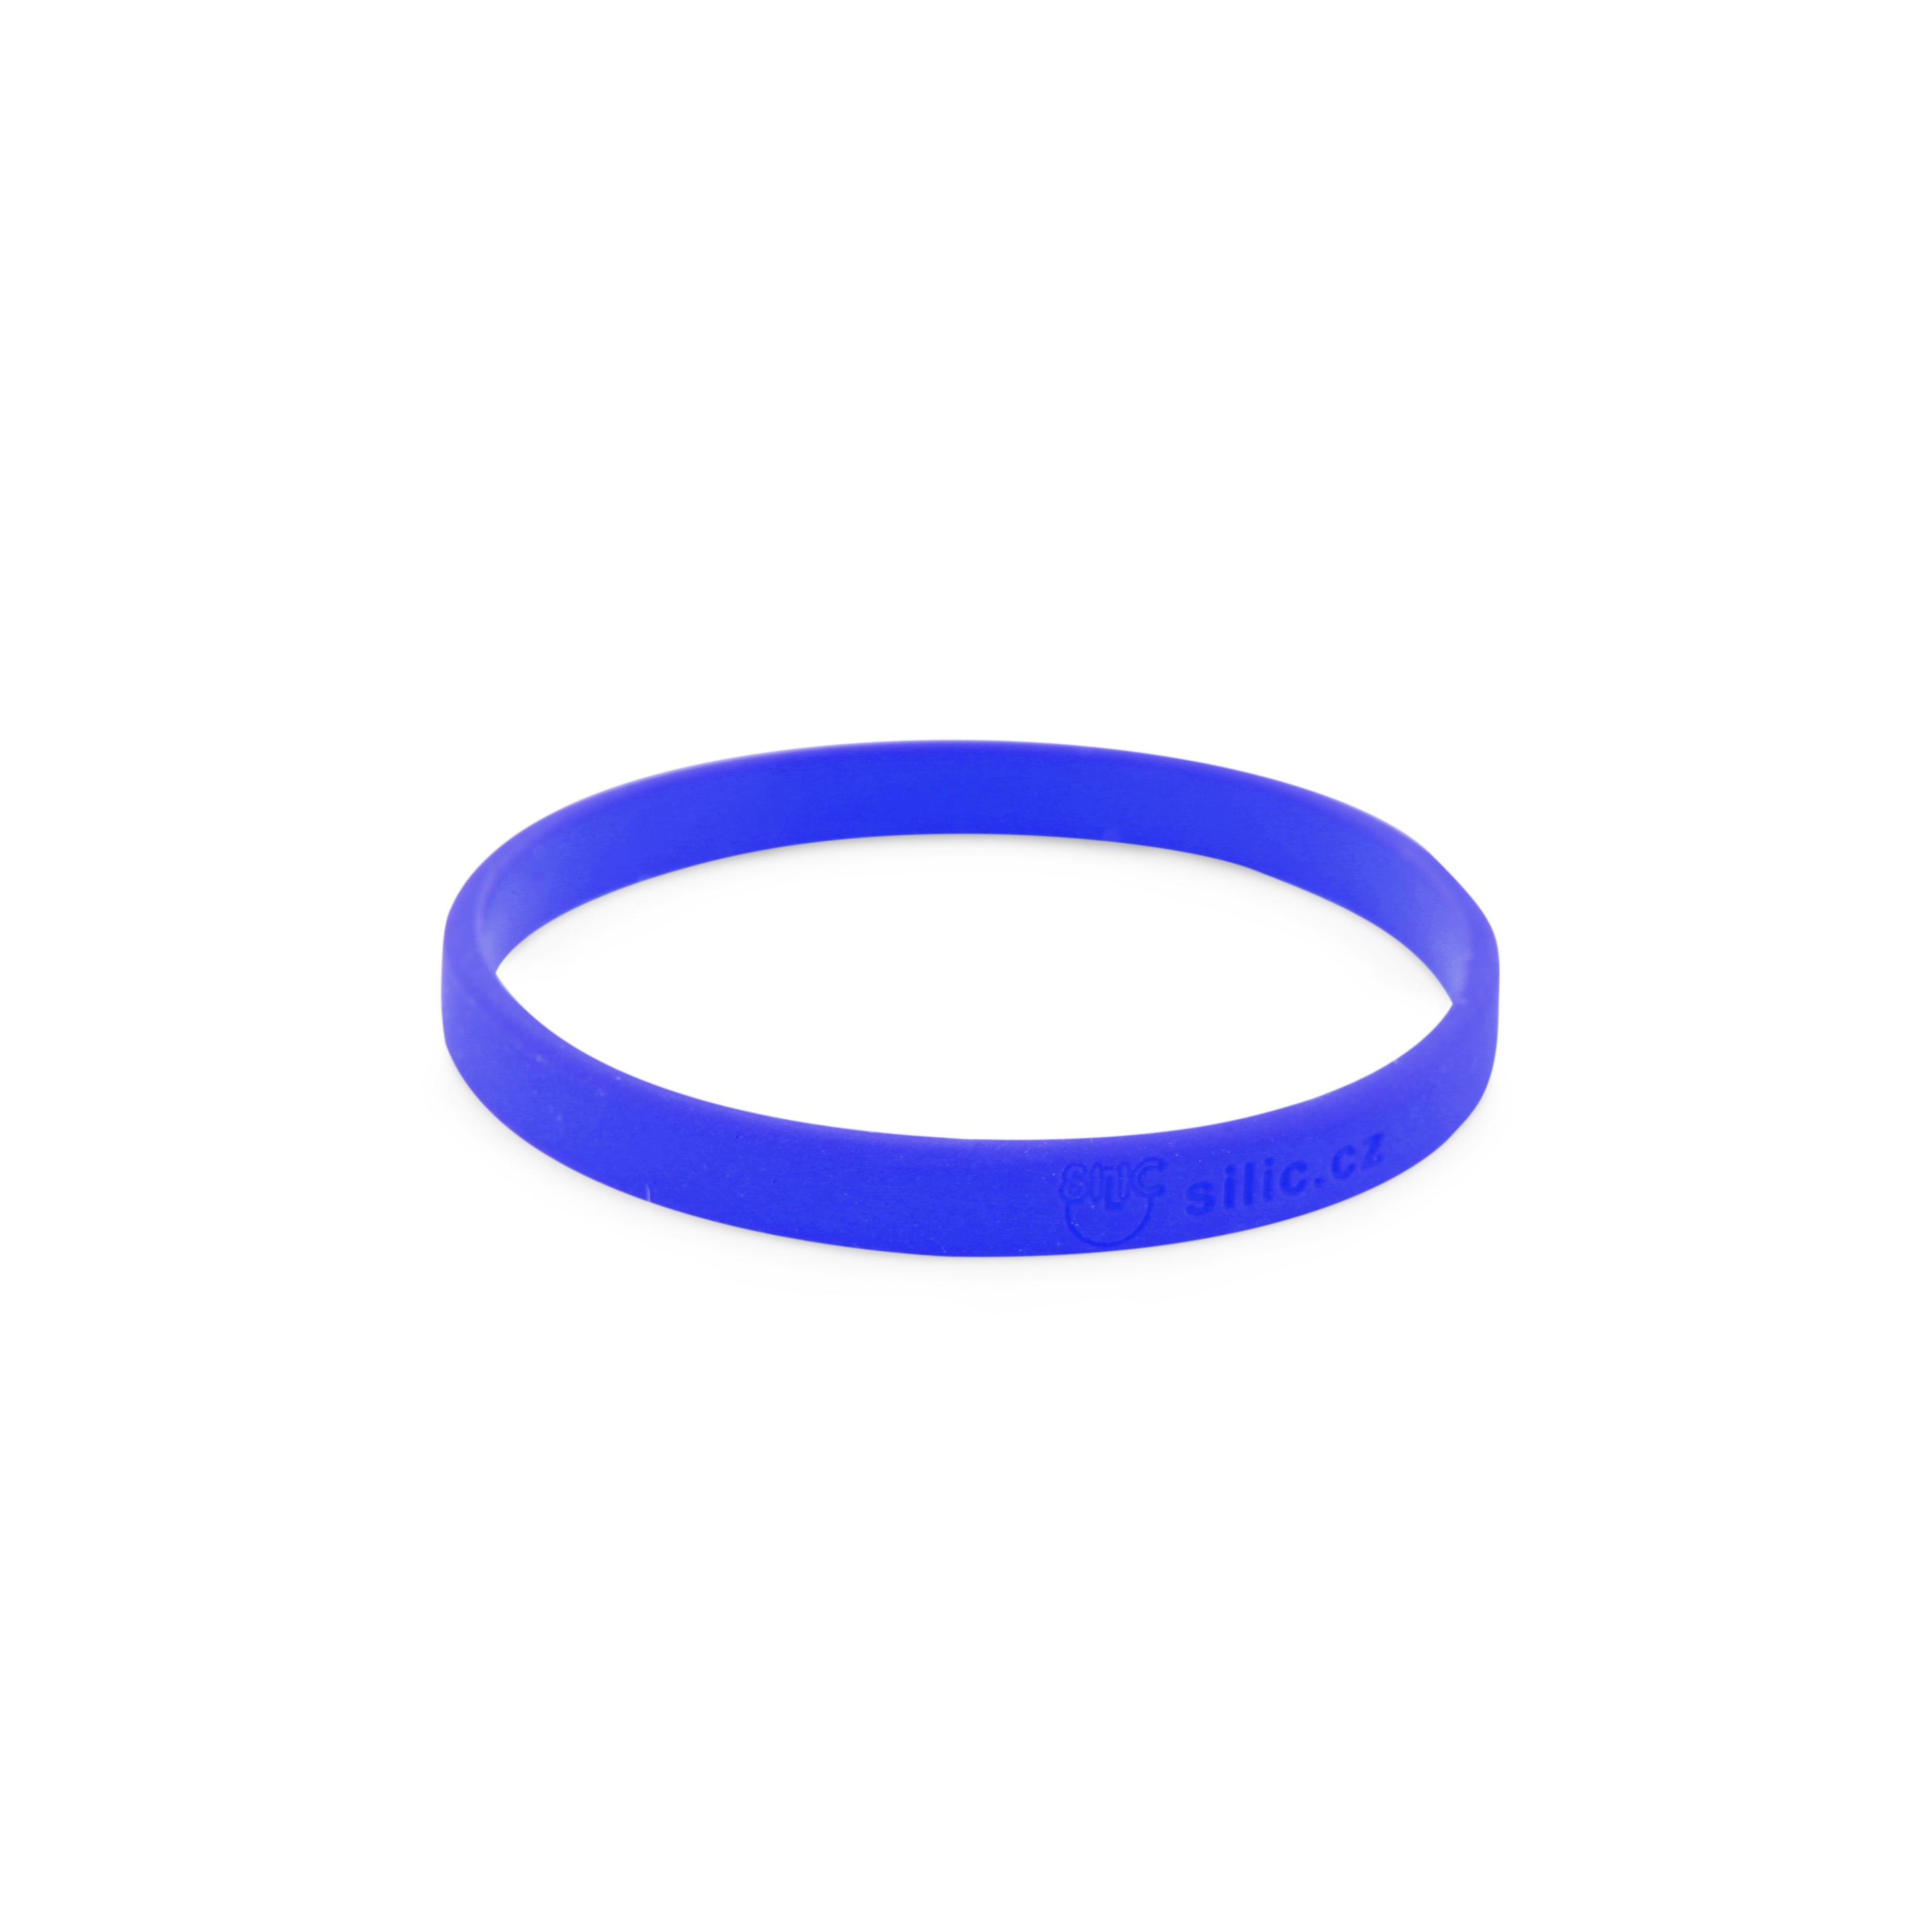 Náramek Deboss modrý